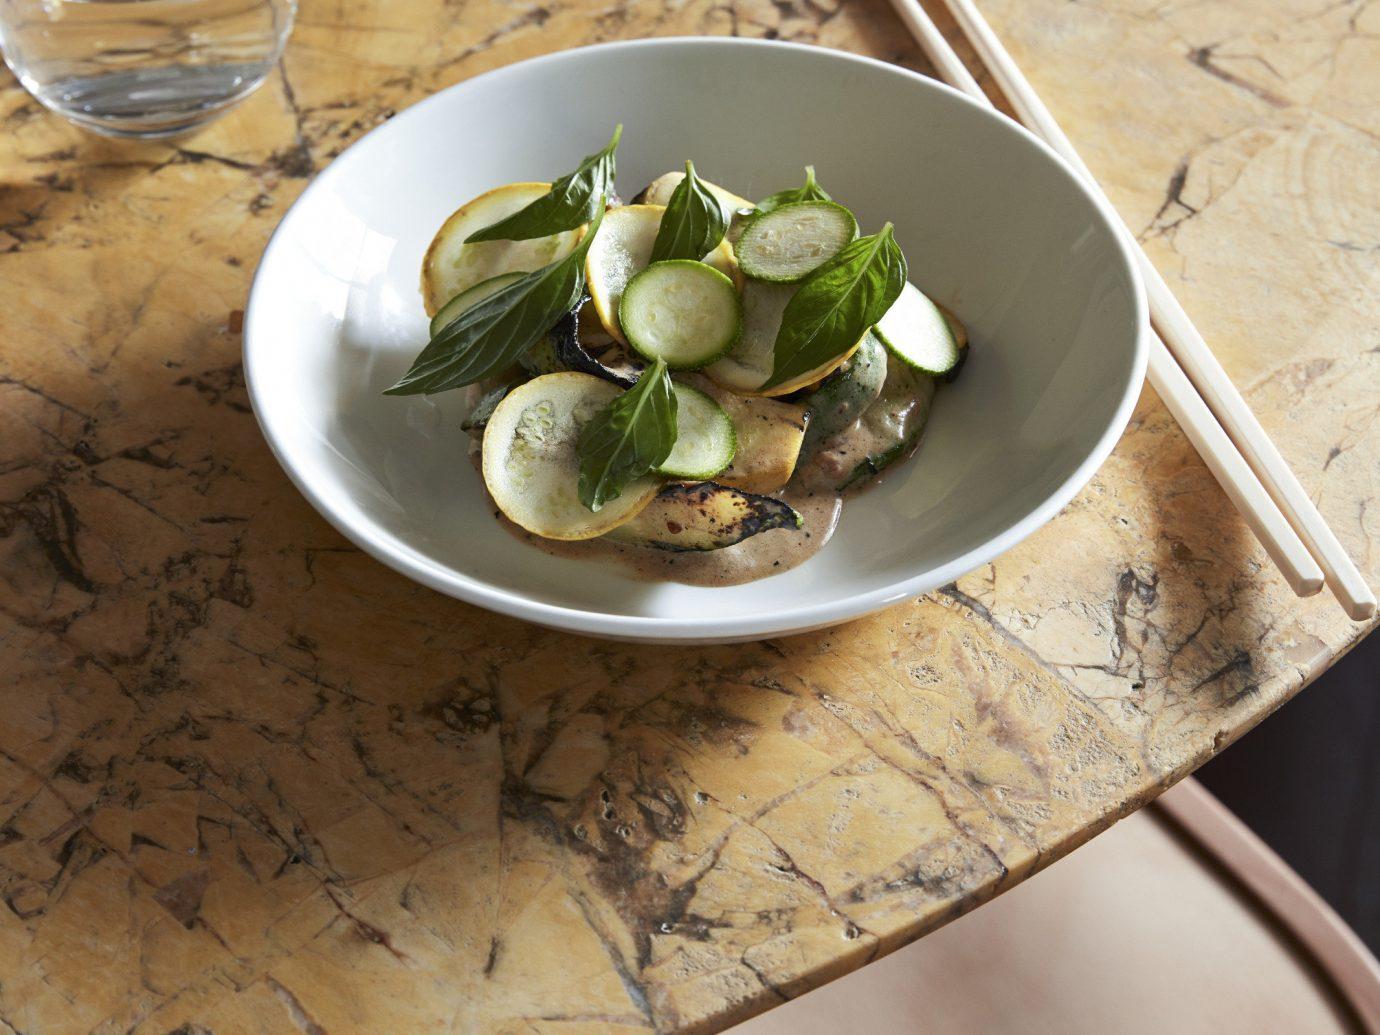 Trip Ideas plate table food dish produce land plant cuisine vegetable meal flowering plant coconut